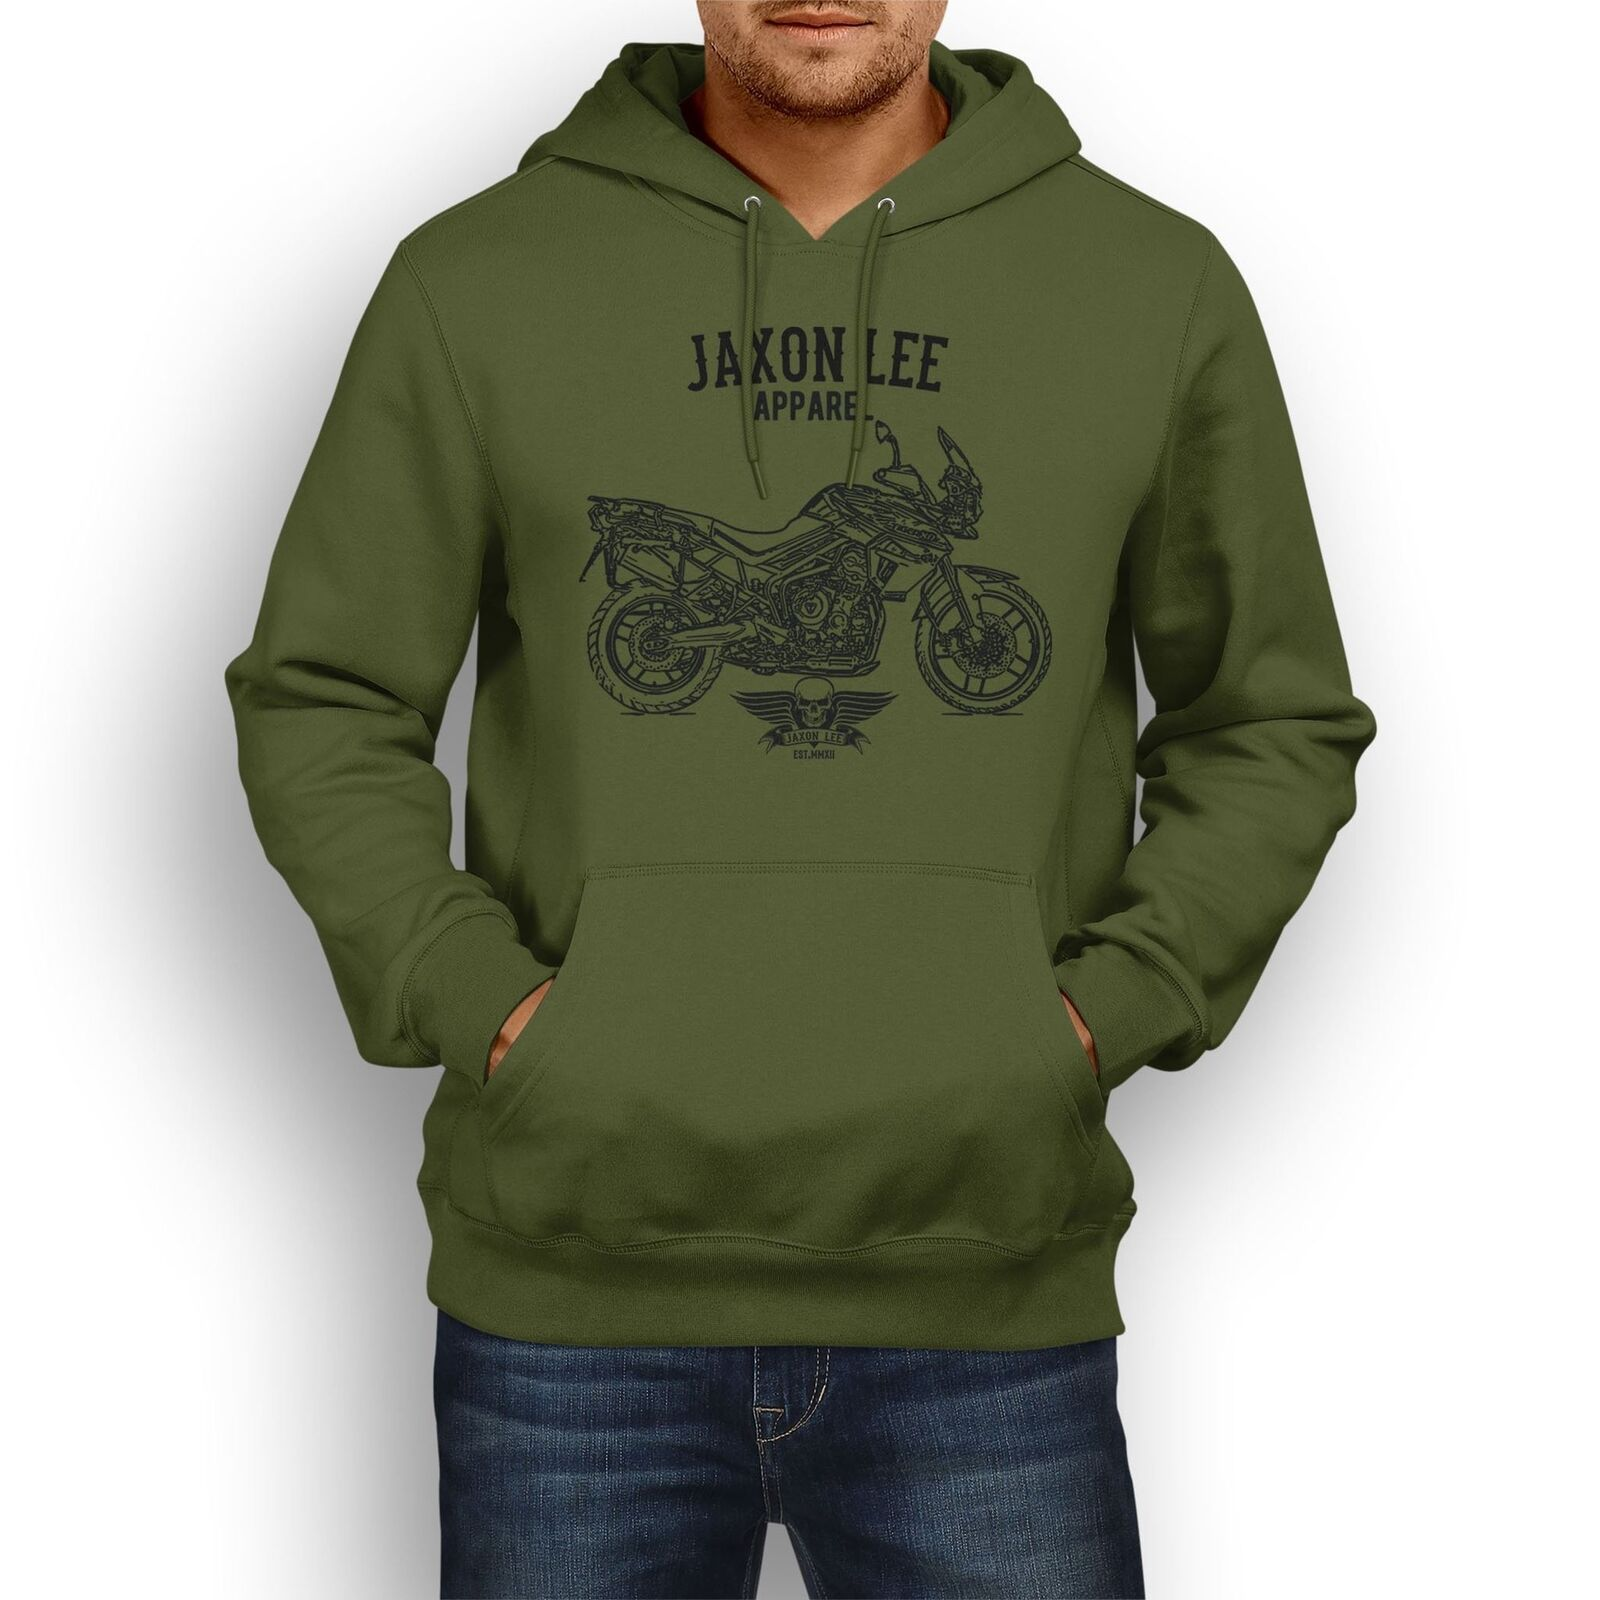 Jaxon Lee Triumph Triumph Triumph Tiger 800 XRT inspirot Motorcycle Art Hoody | Haltbar  975918